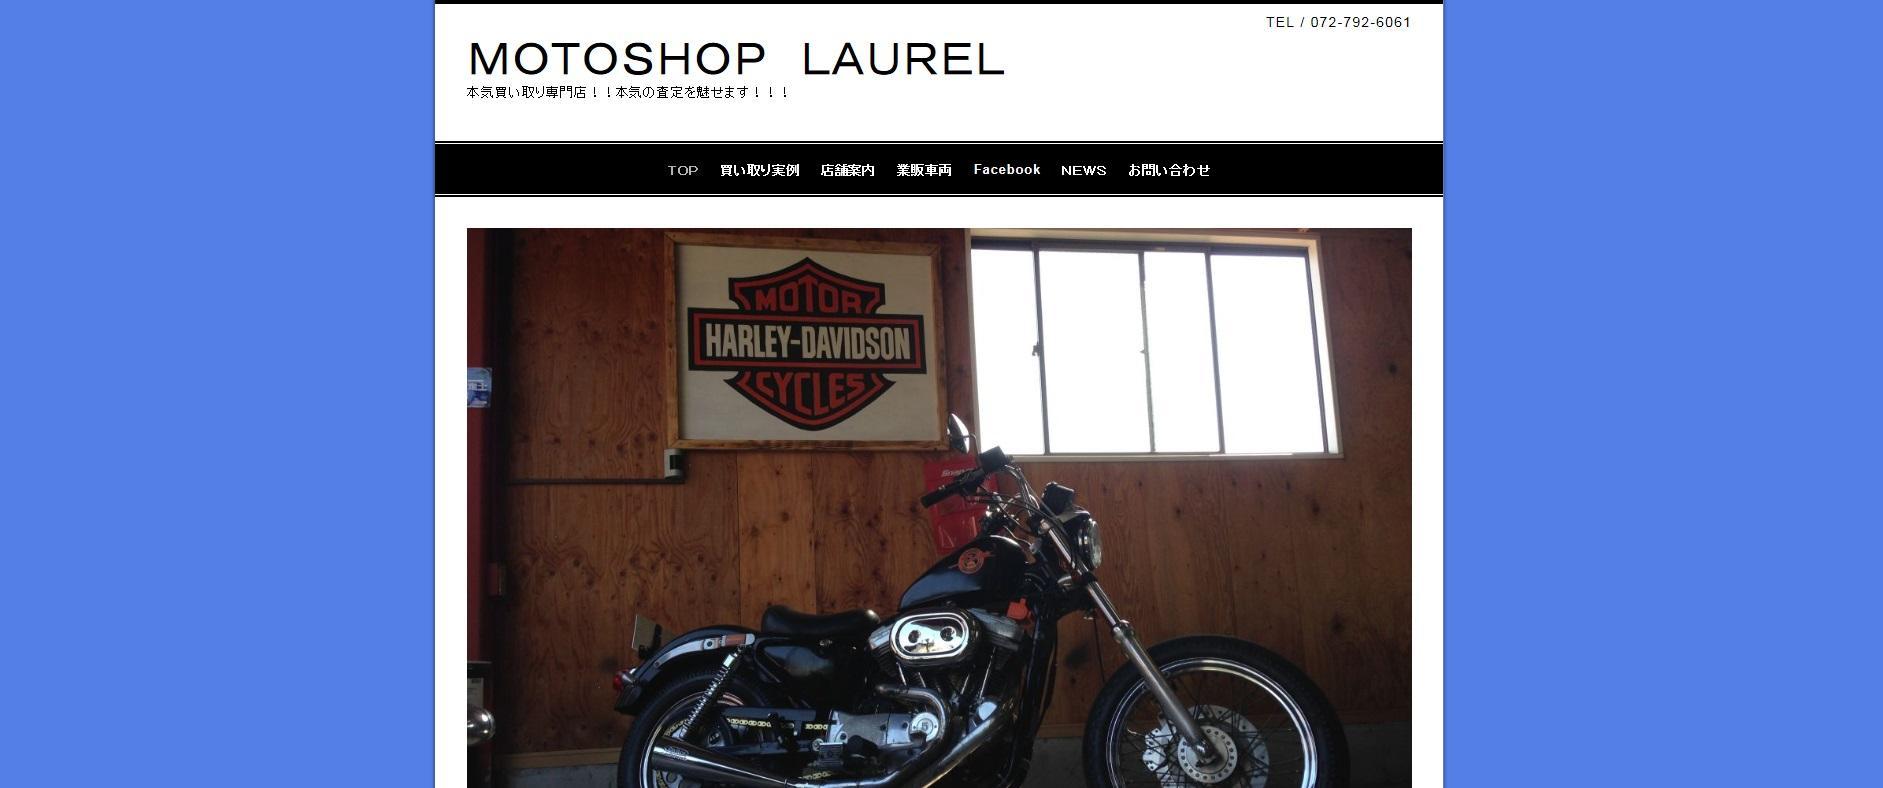 MOTO SHOP LAUREL